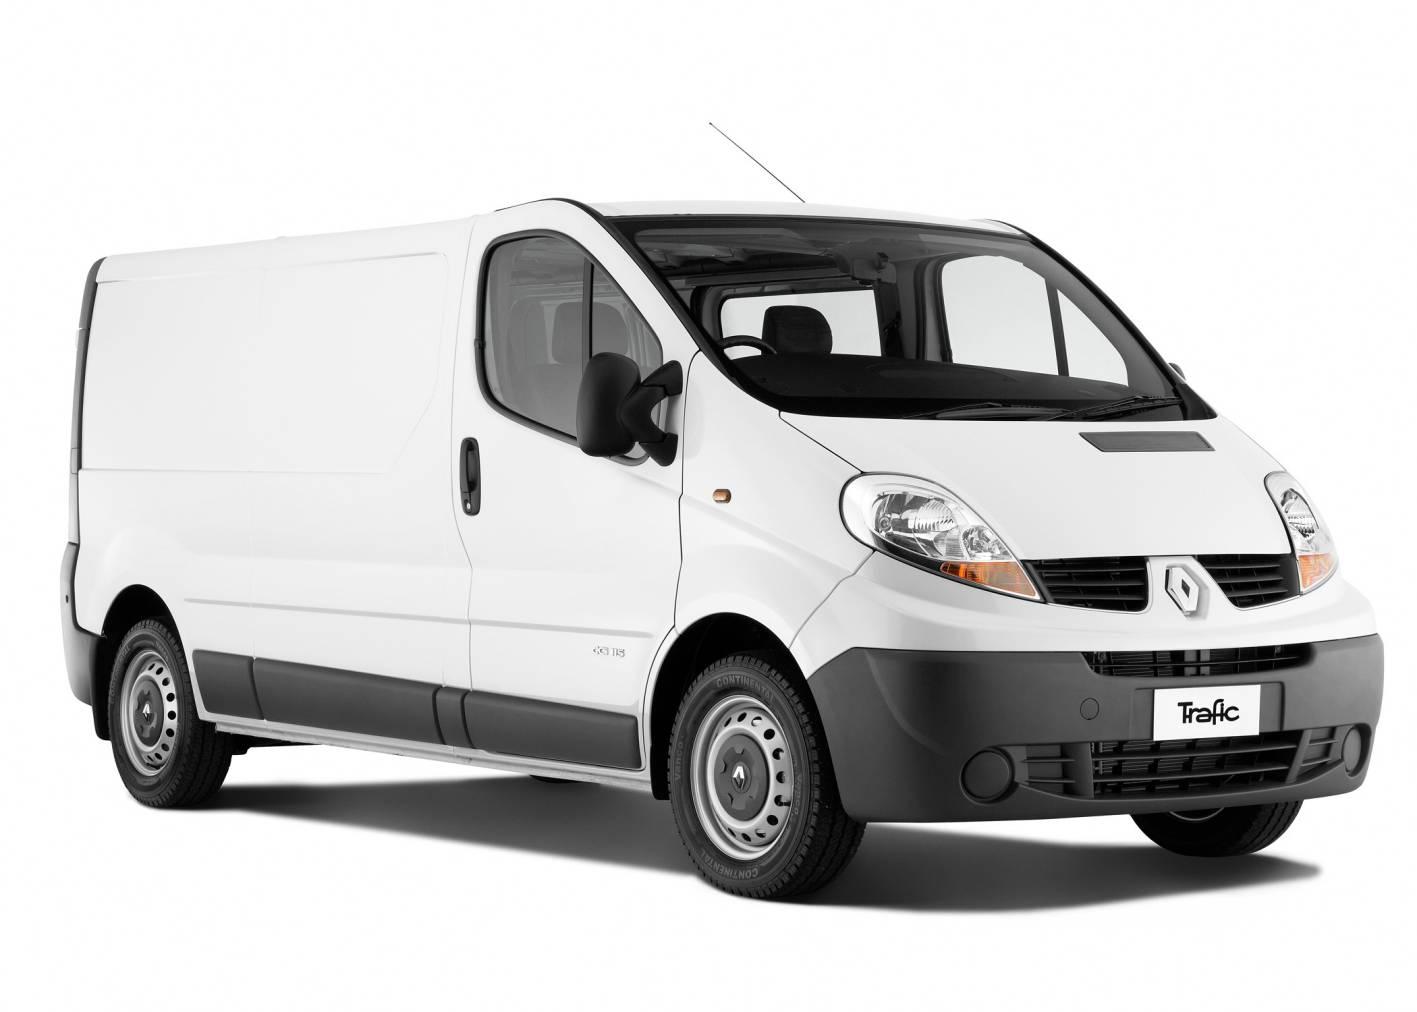 auspost picks renault vans photos caradvice. Black Bedroom Furniture Sets. Home Design Ideas